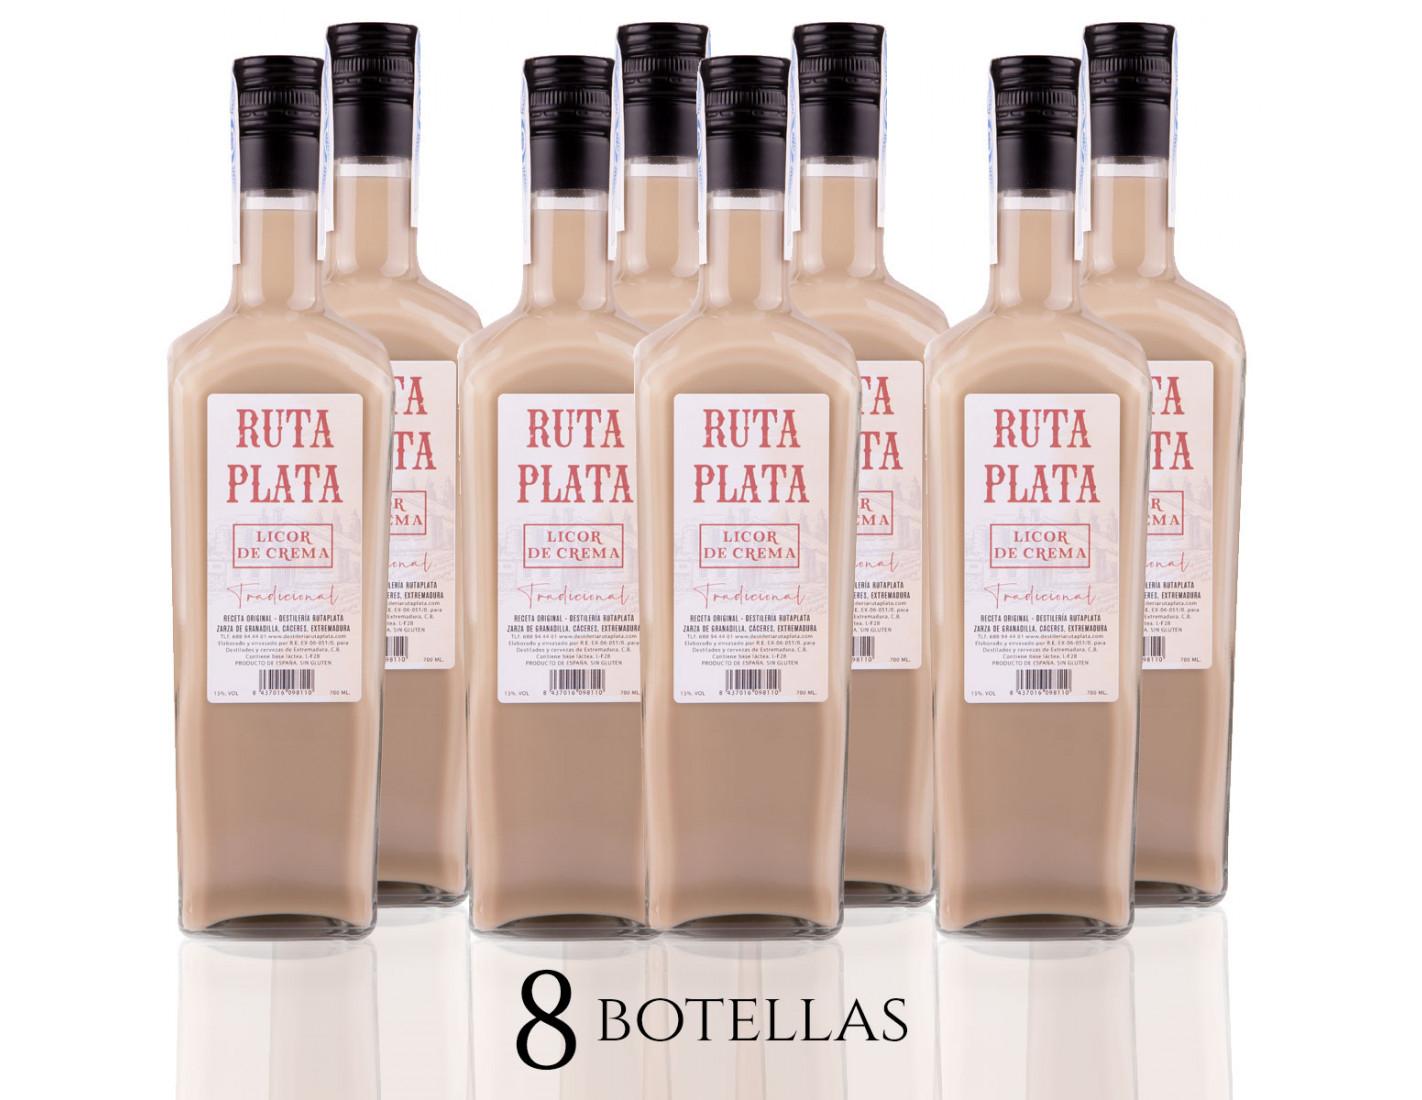 Pack 8 Crema de Orujo RutaPlata 700 ml - Licor de Crema